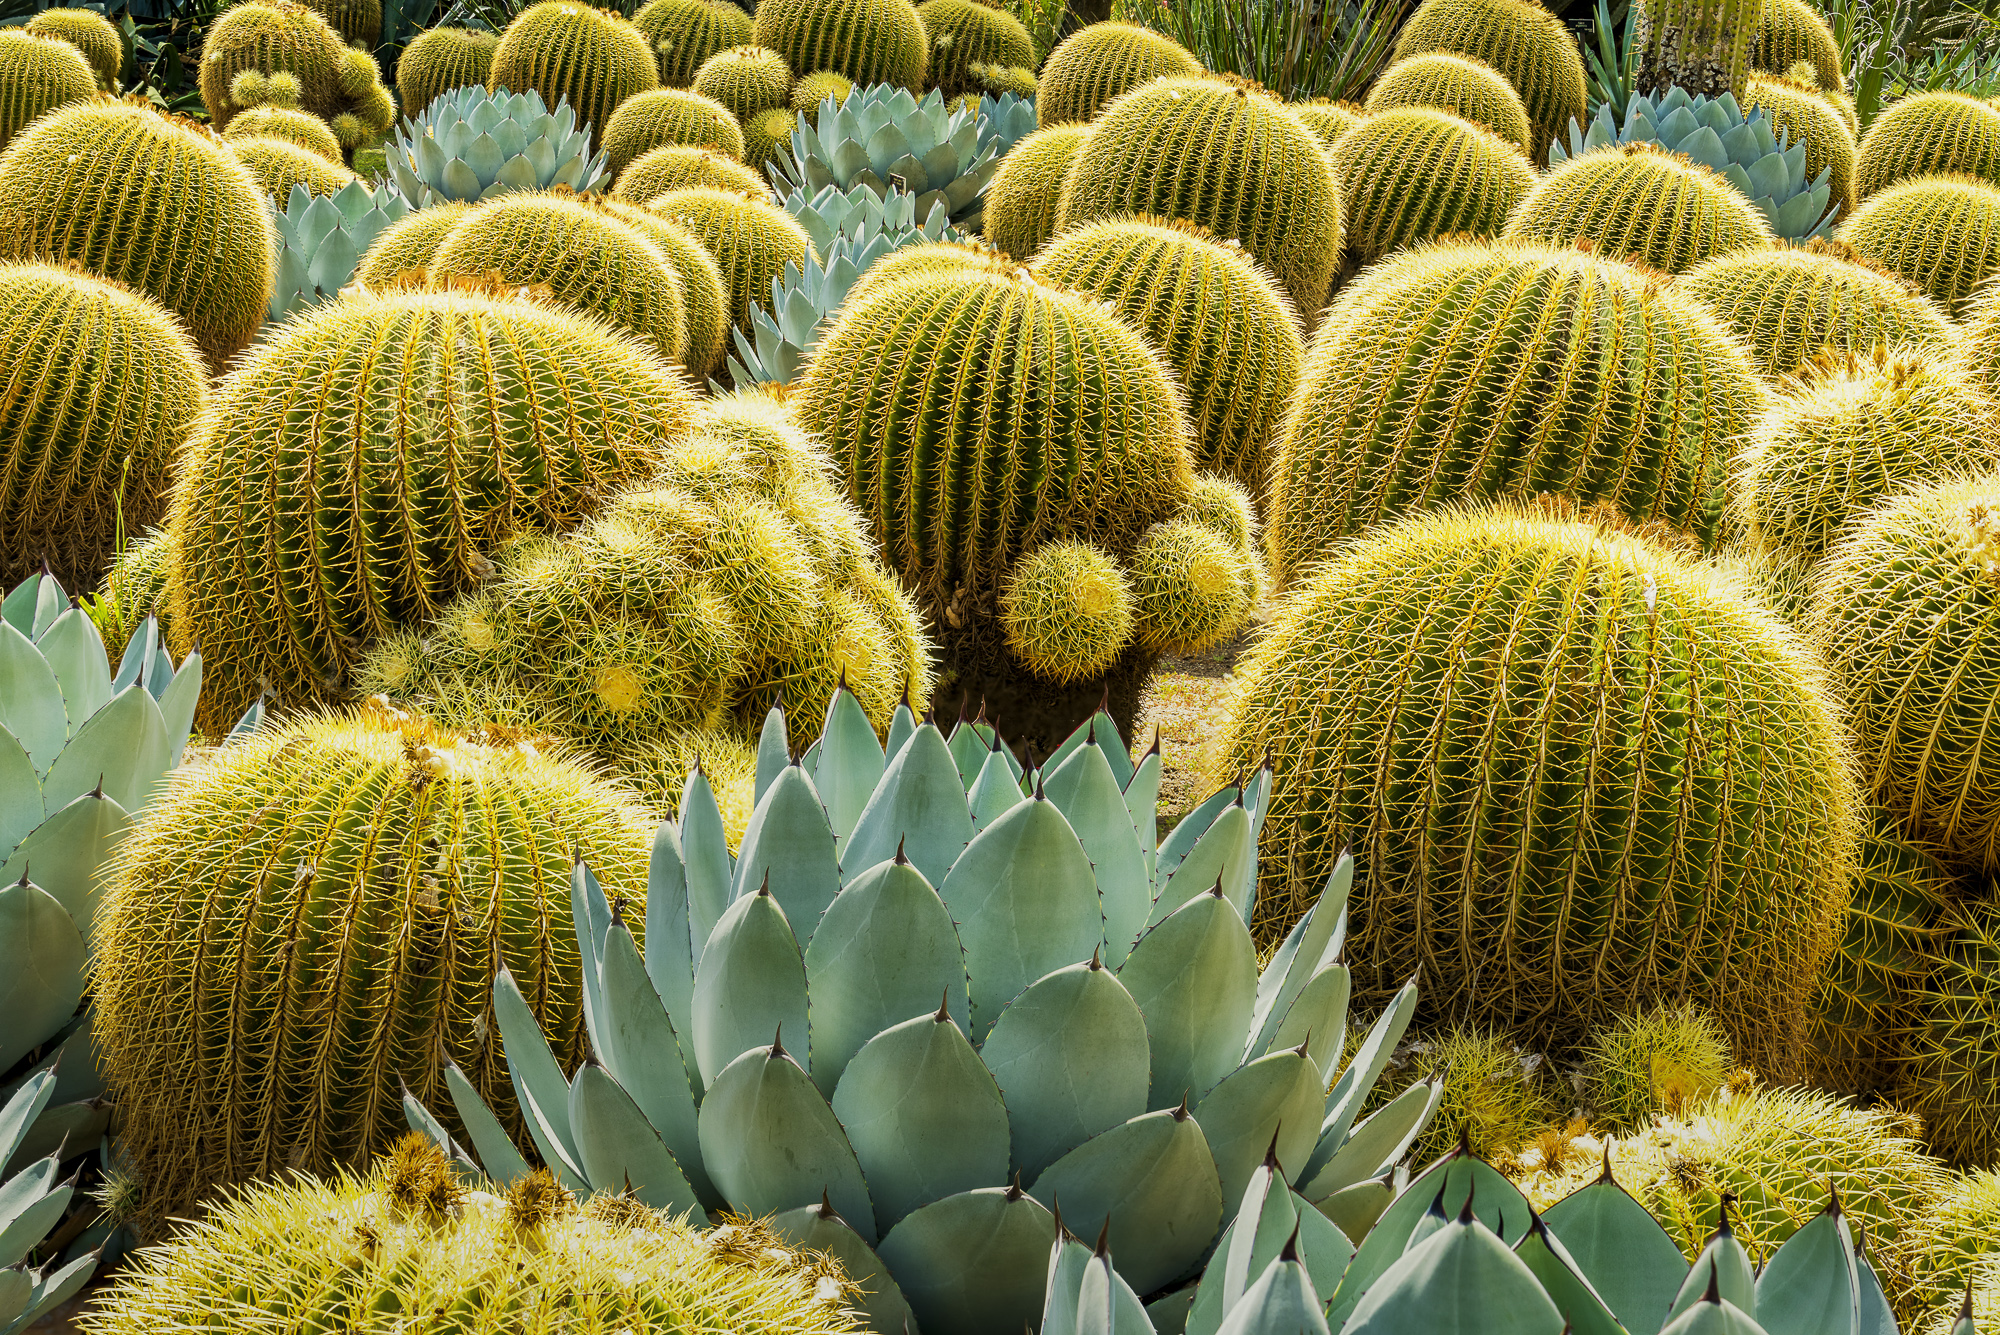 Golden Barrel Cacti & Agave, Huntington Botanical Gardens, San Marino, California, USA